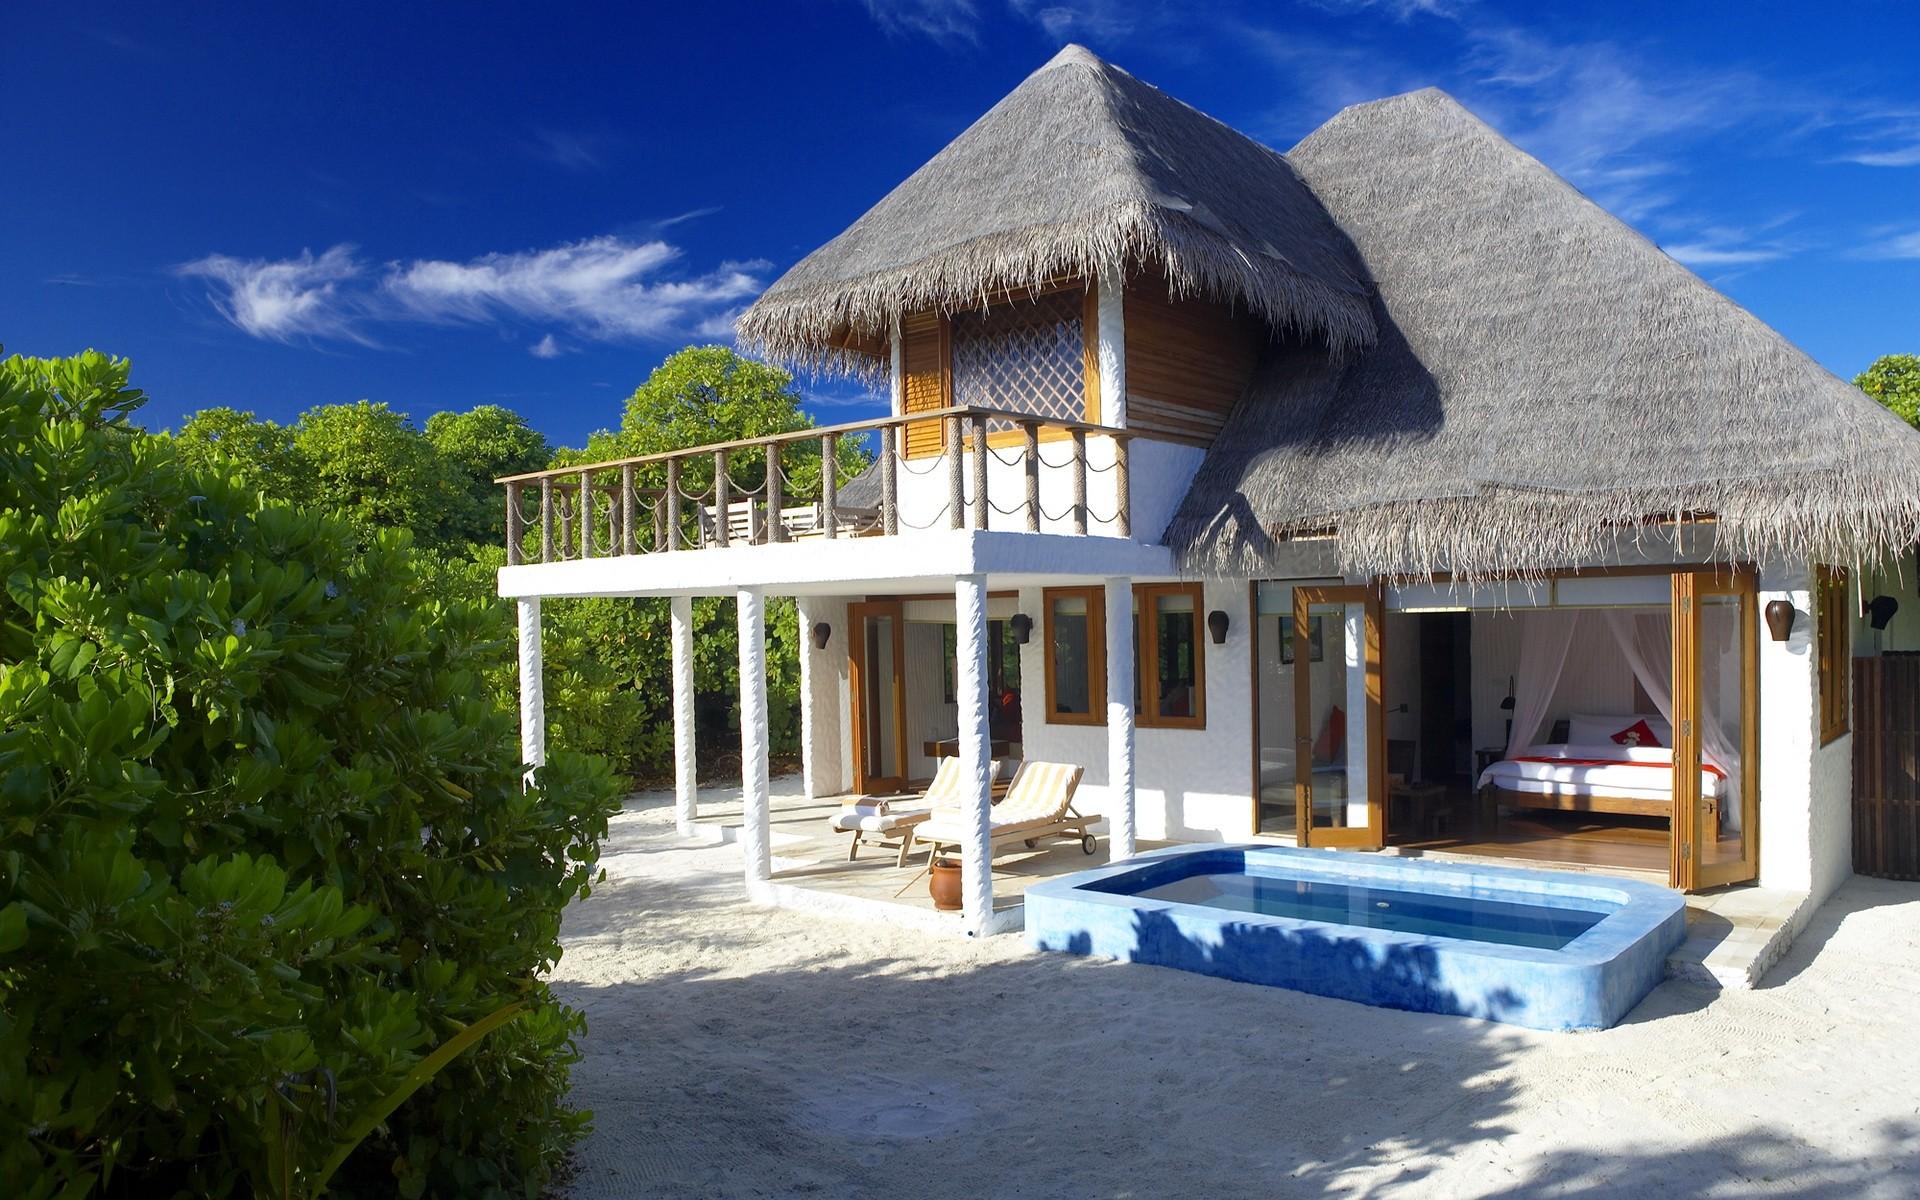 Diseño de casa de playa - 1920x1200